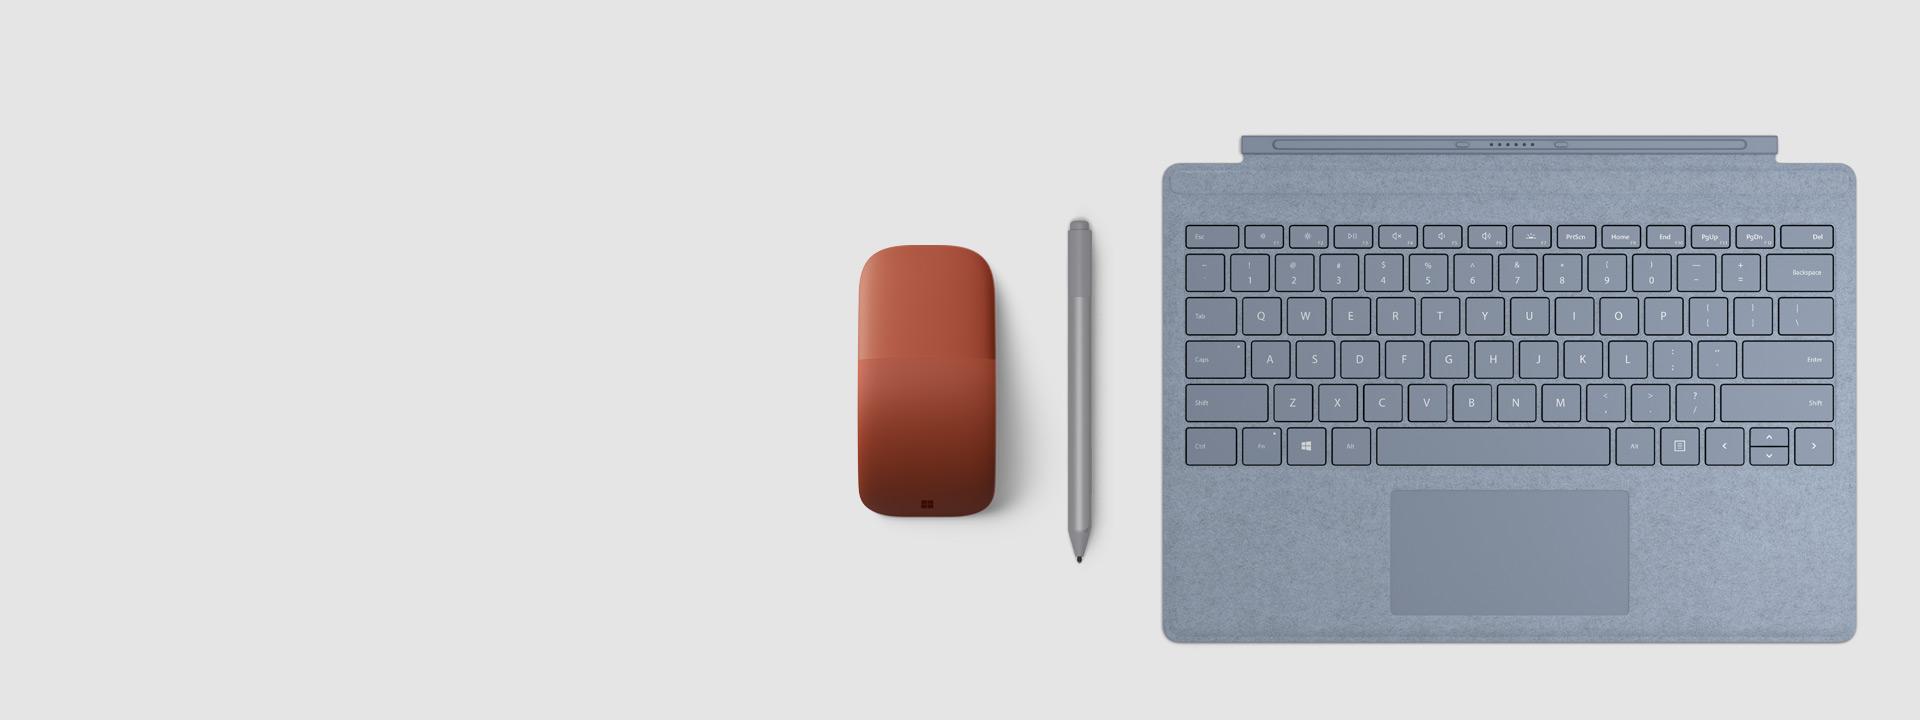 Surface 手寫筆、Signature 實體鍵盤保護蓋和 Surface Arc 滑鼠